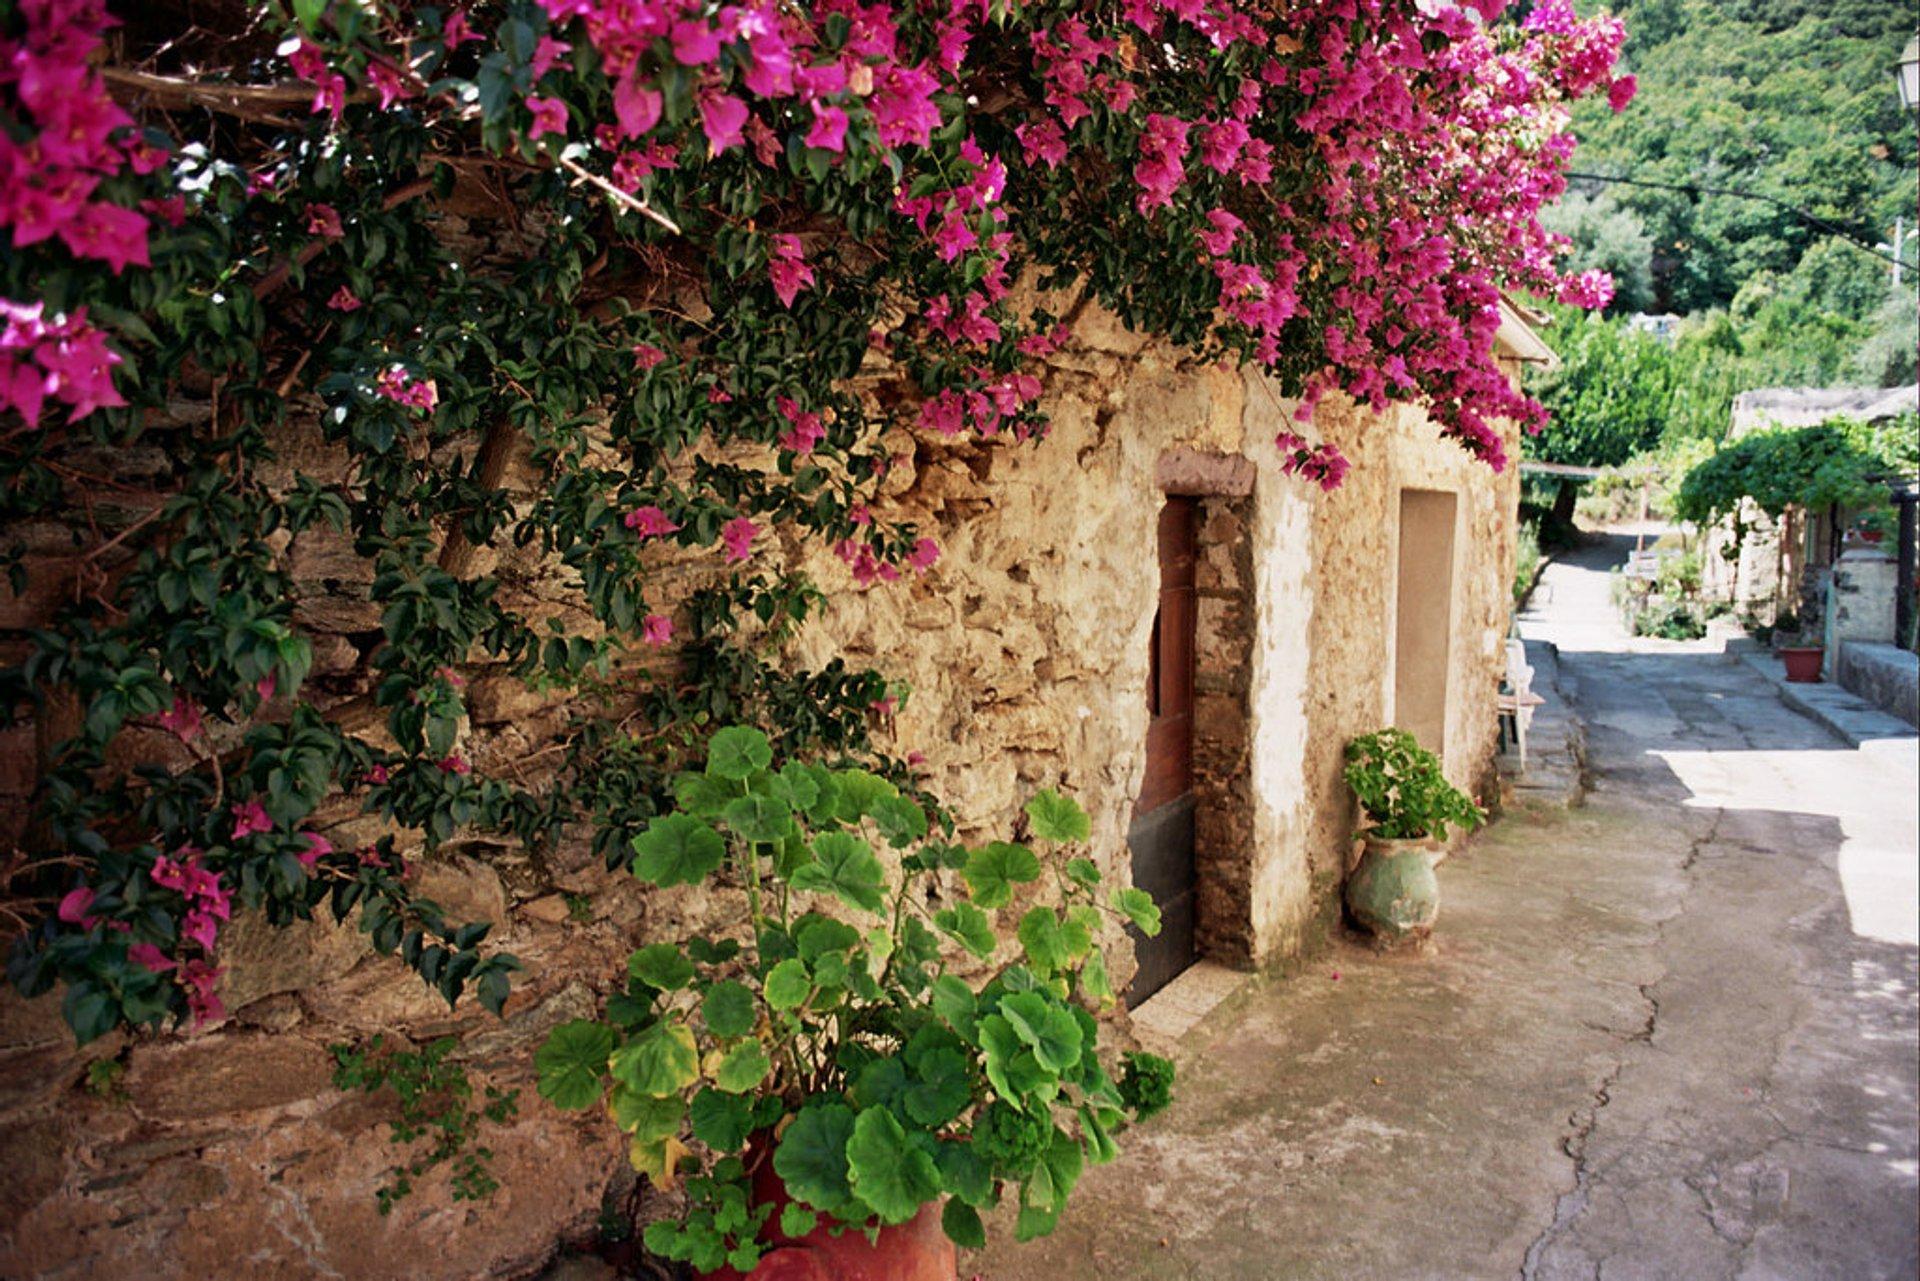 Wildflowers in Bloom in Corsica 2020 - Best Time